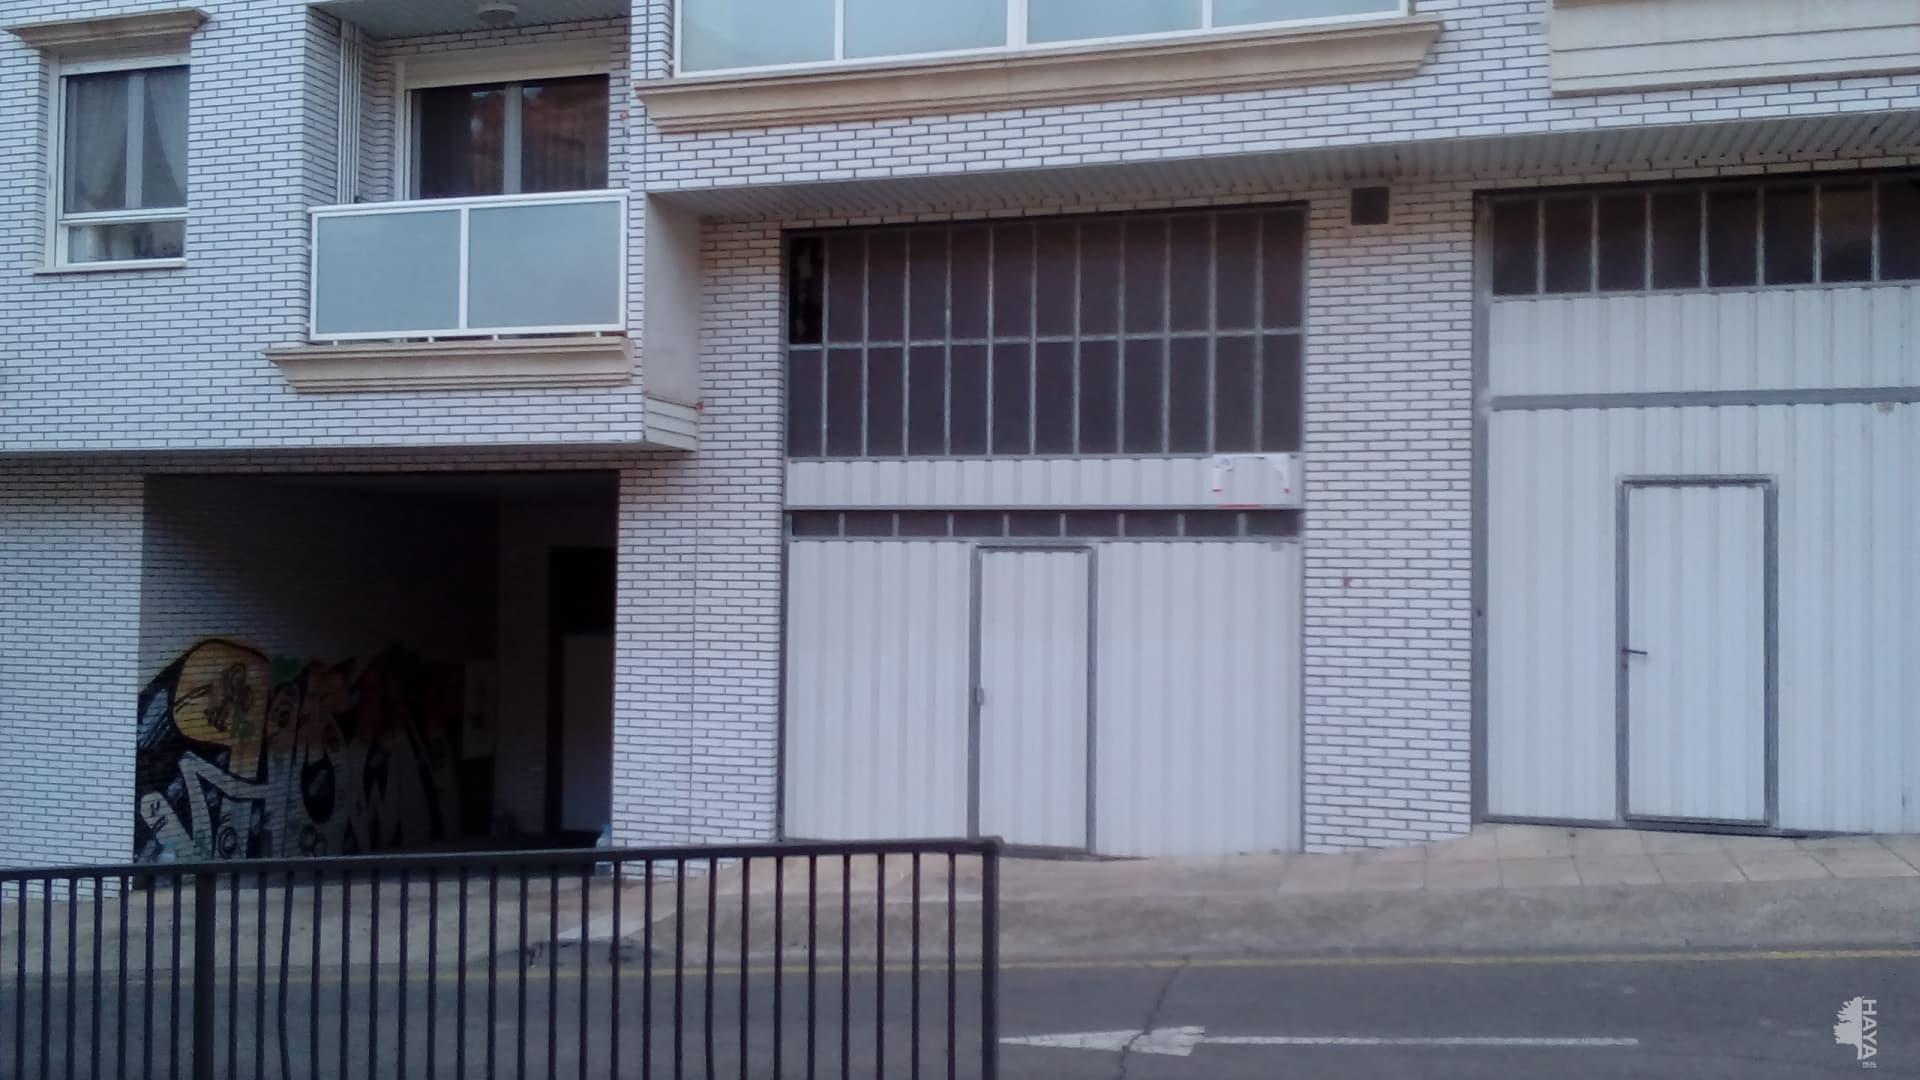 Local en venta en Arnedo, La Rioja, Calle Timoteo Ruiz, 75.000 €, 109 m2